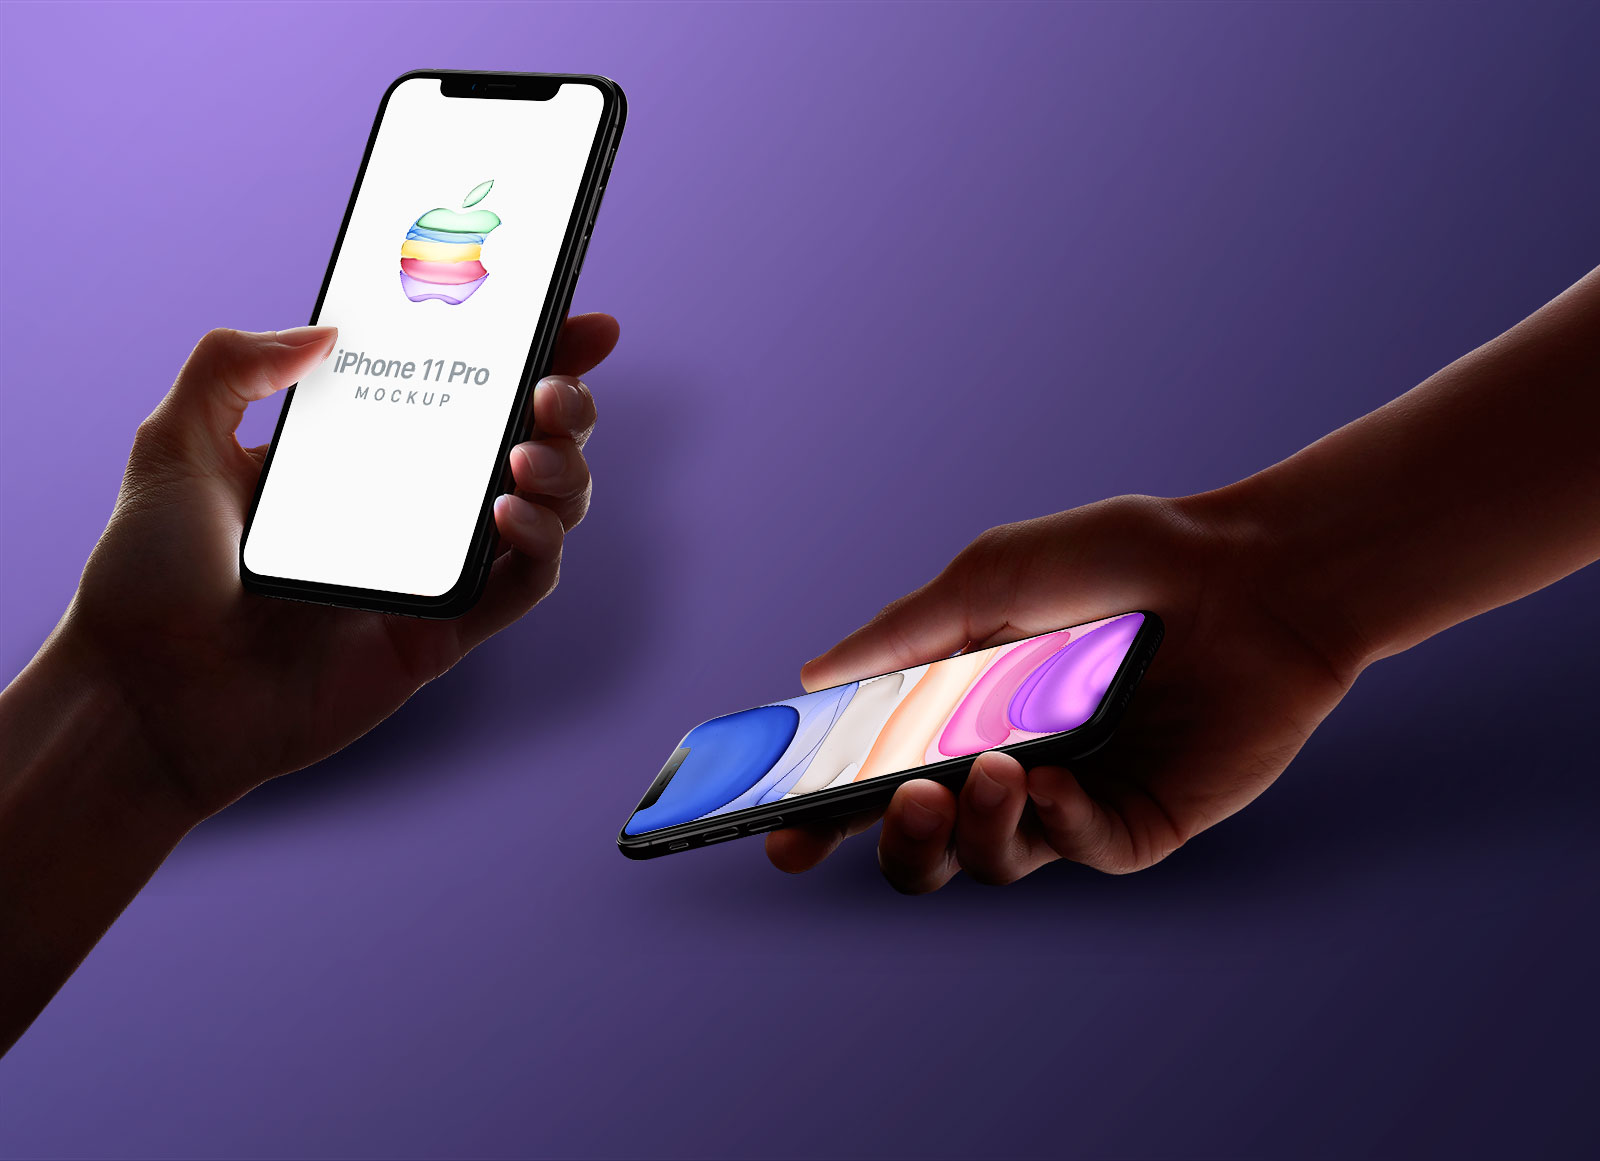 Free Hand Holding iPhone 11 Pro Mockup PSD